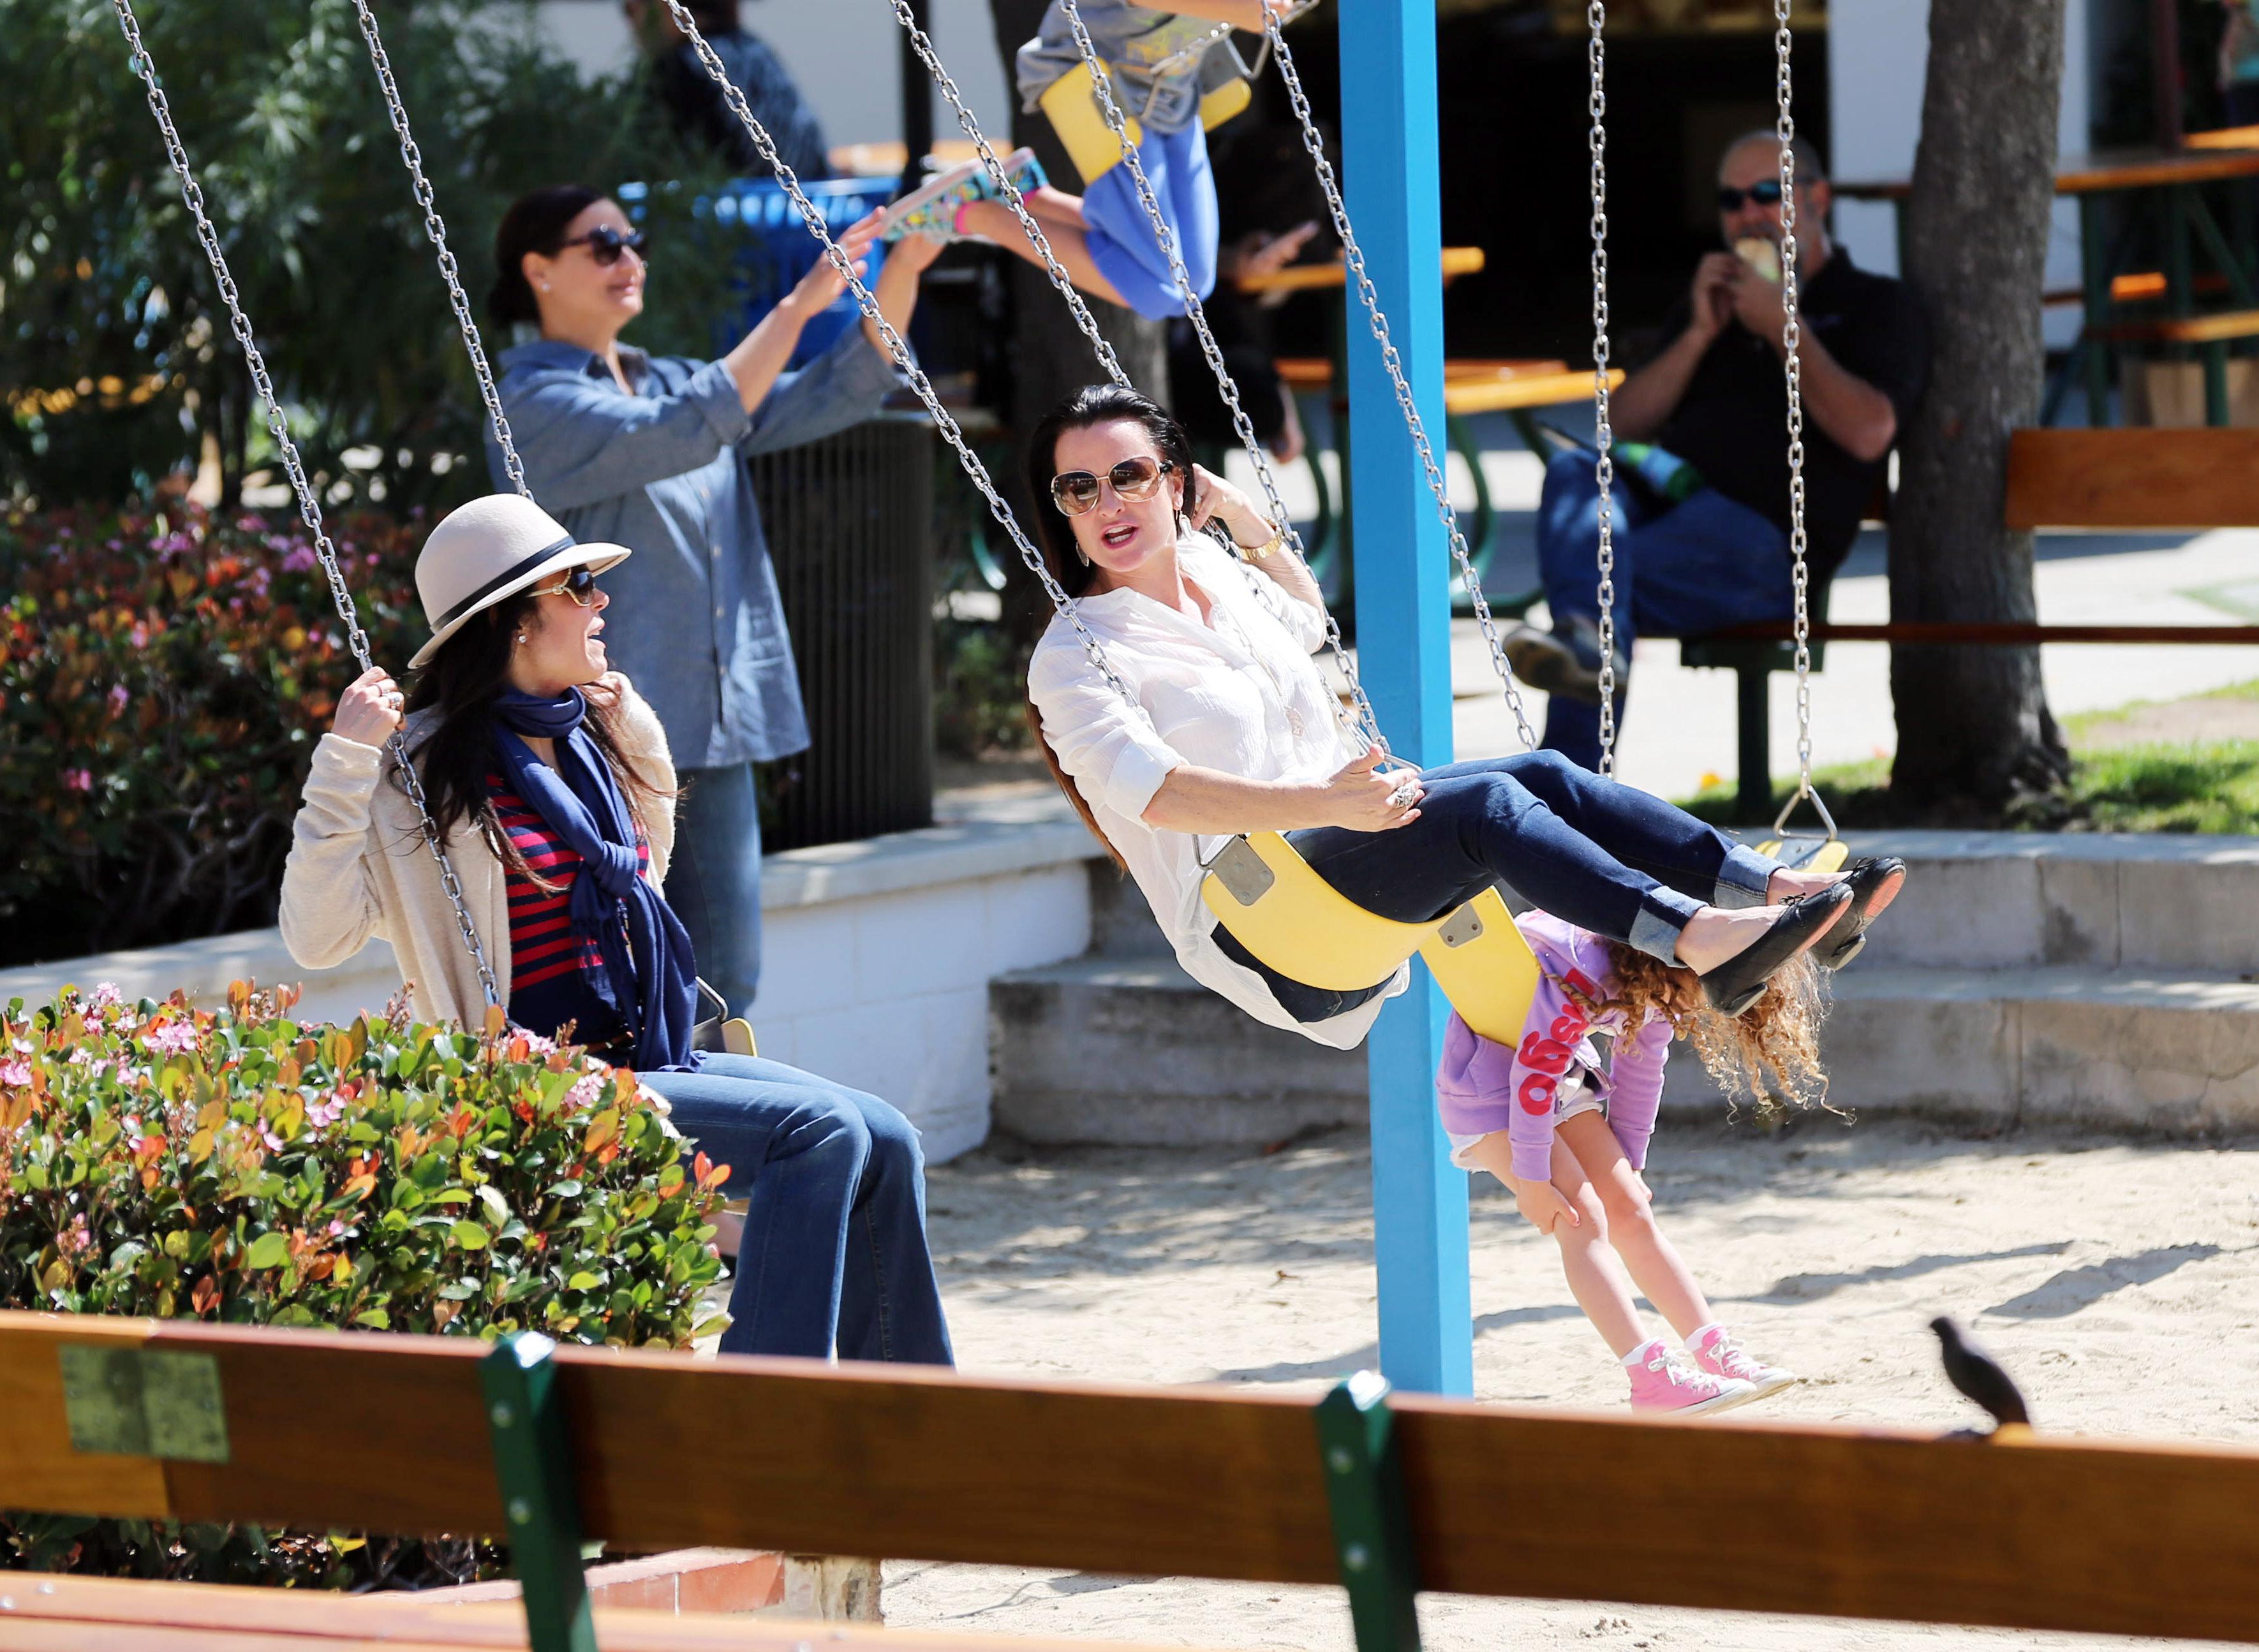 Swinging Housewives In Malibu New York Gossip Gal By Roz